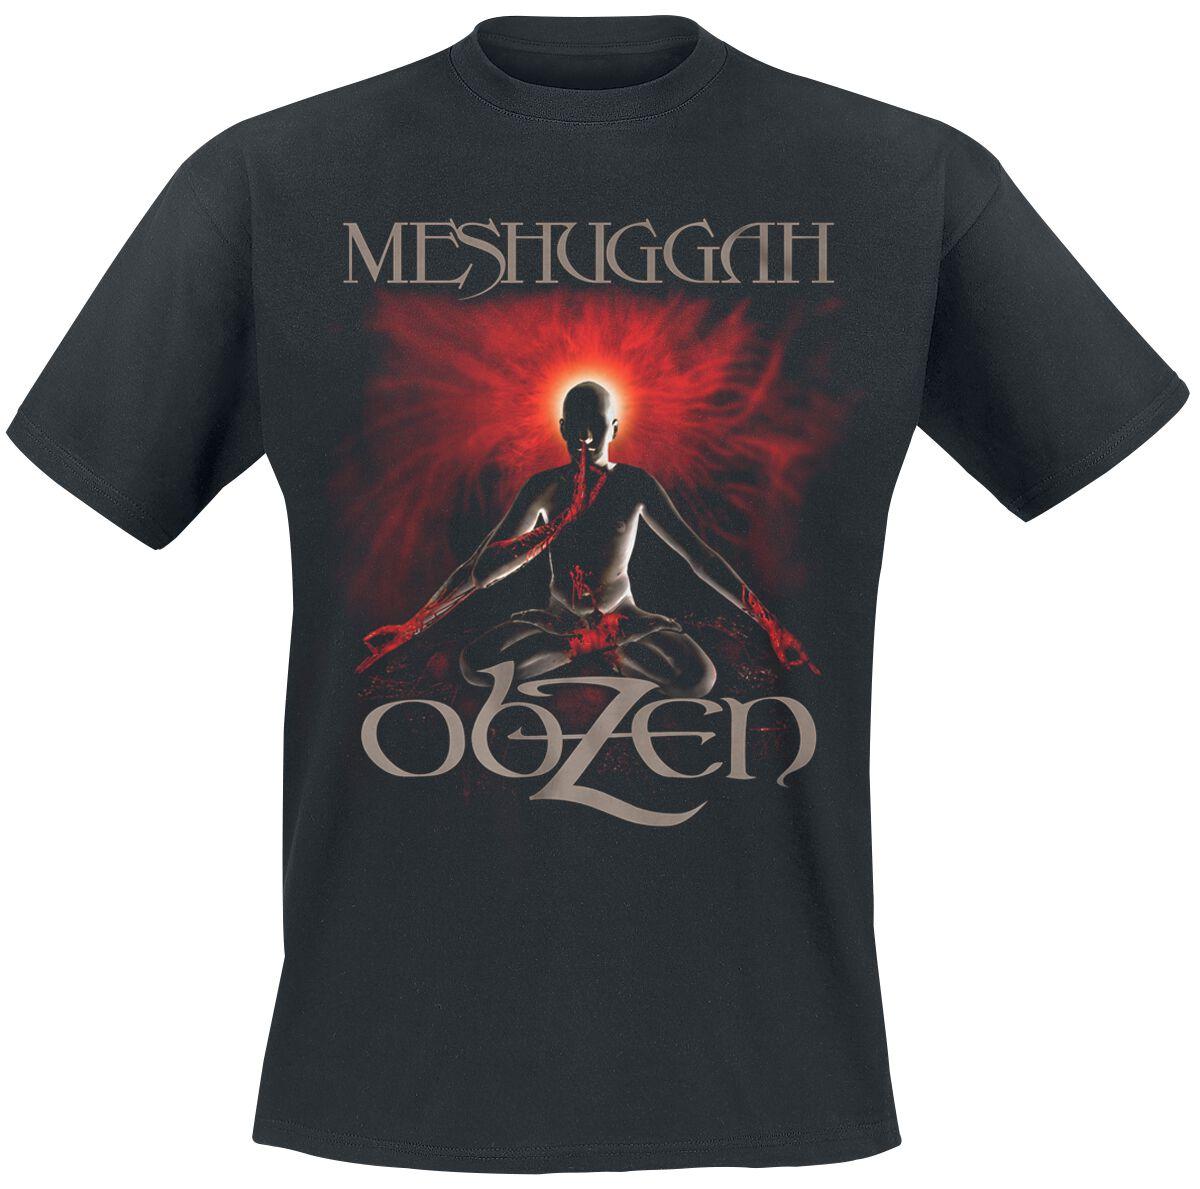 Zespoły - Koszulki - T-Shirt Meshuggah Obzen T-Shirt czarny - 358979